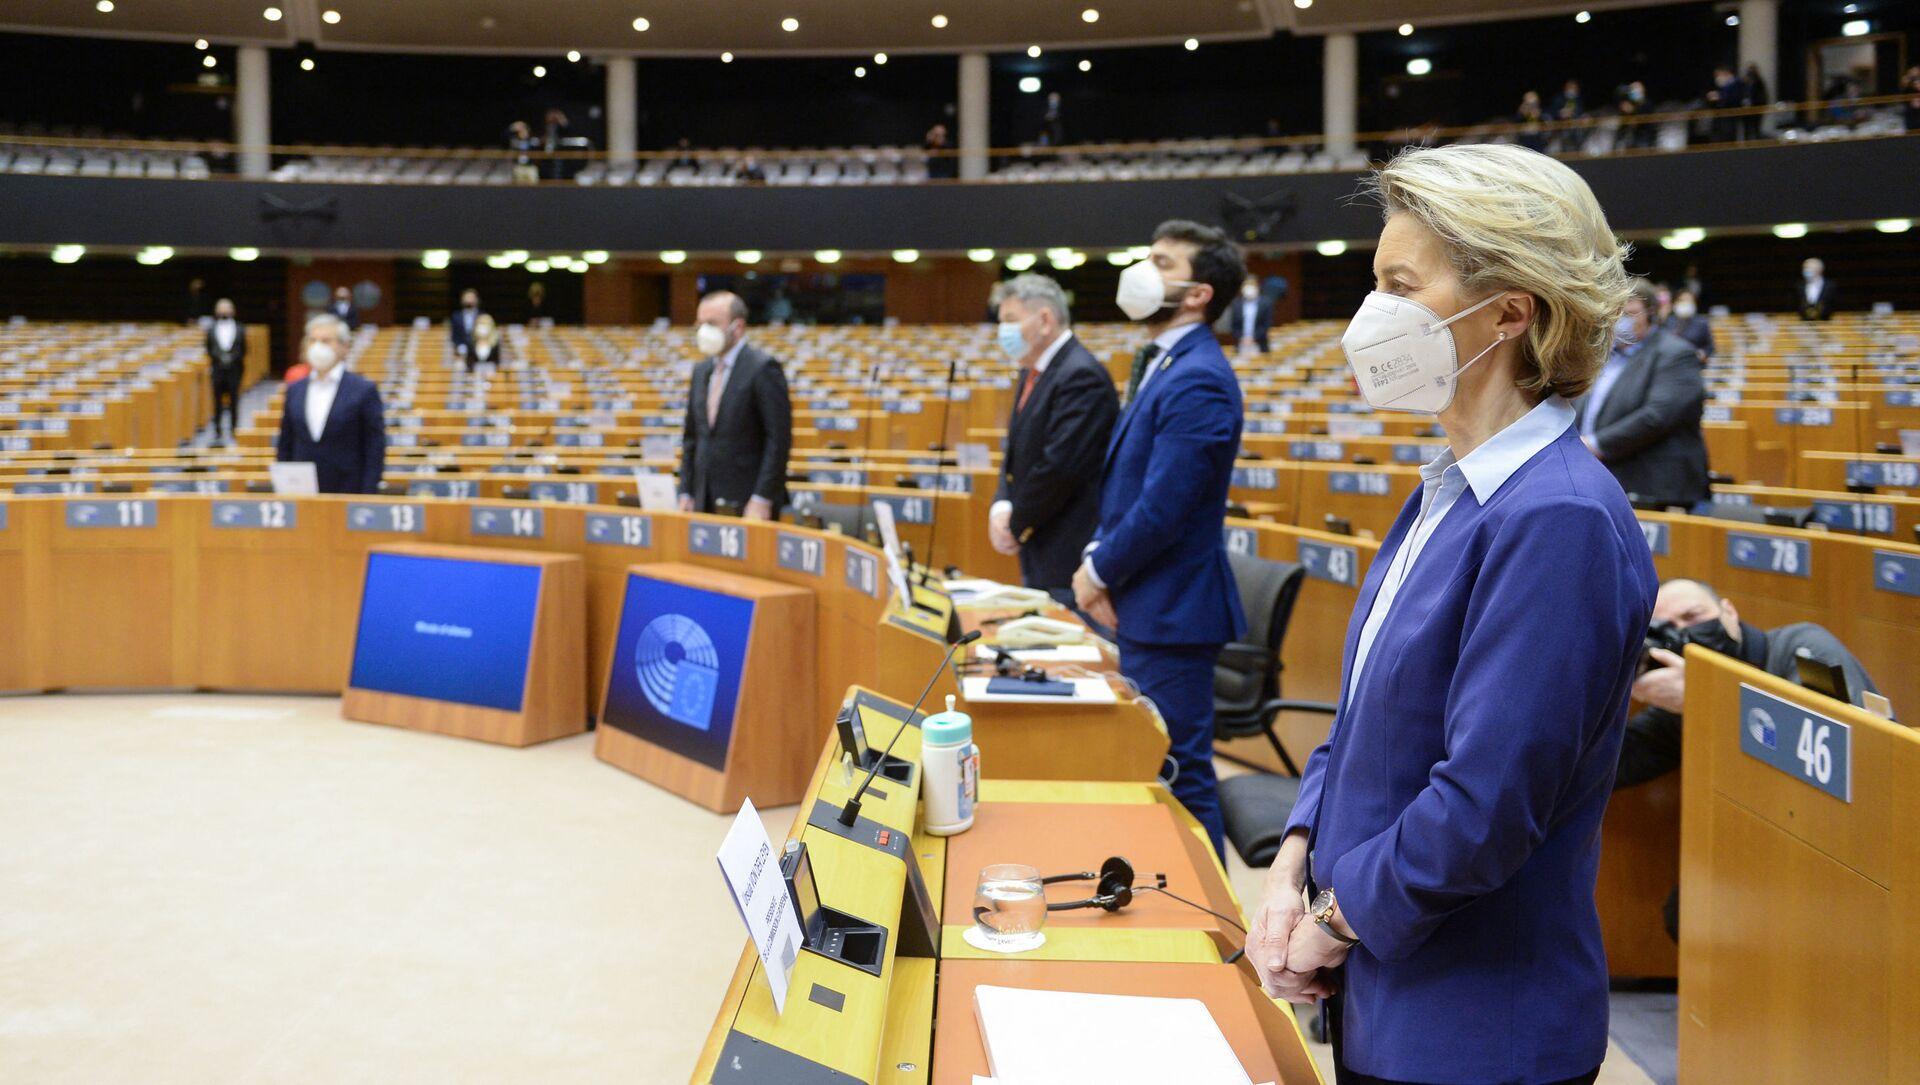 Parlament Europejski - Sputnik Polska, 1920, 10.02.2021